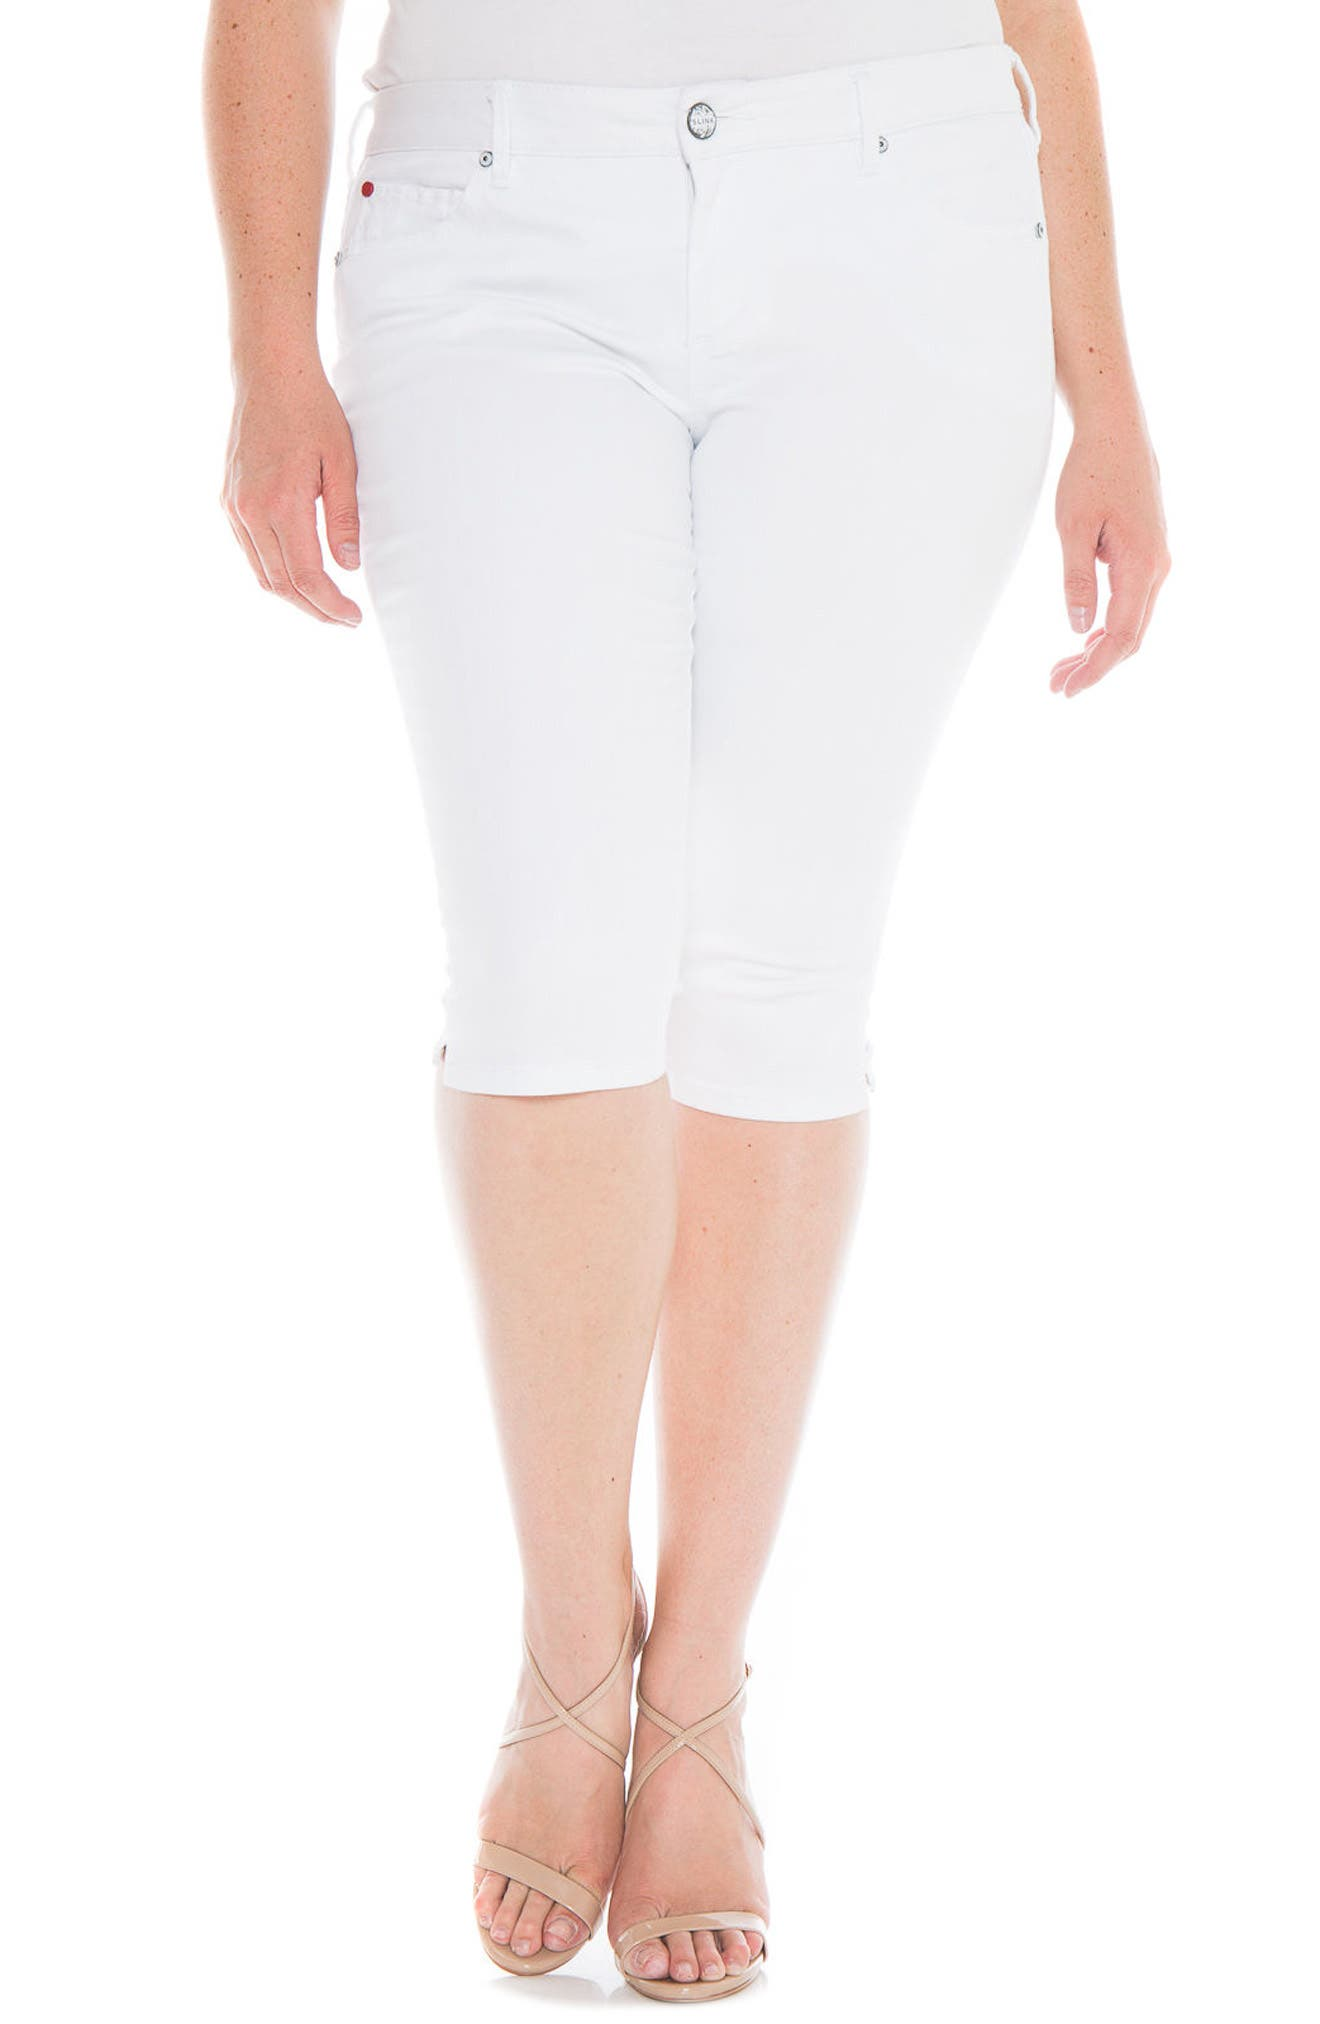 Pirate Skinny Capri Jeans,                         Main,                         color, White